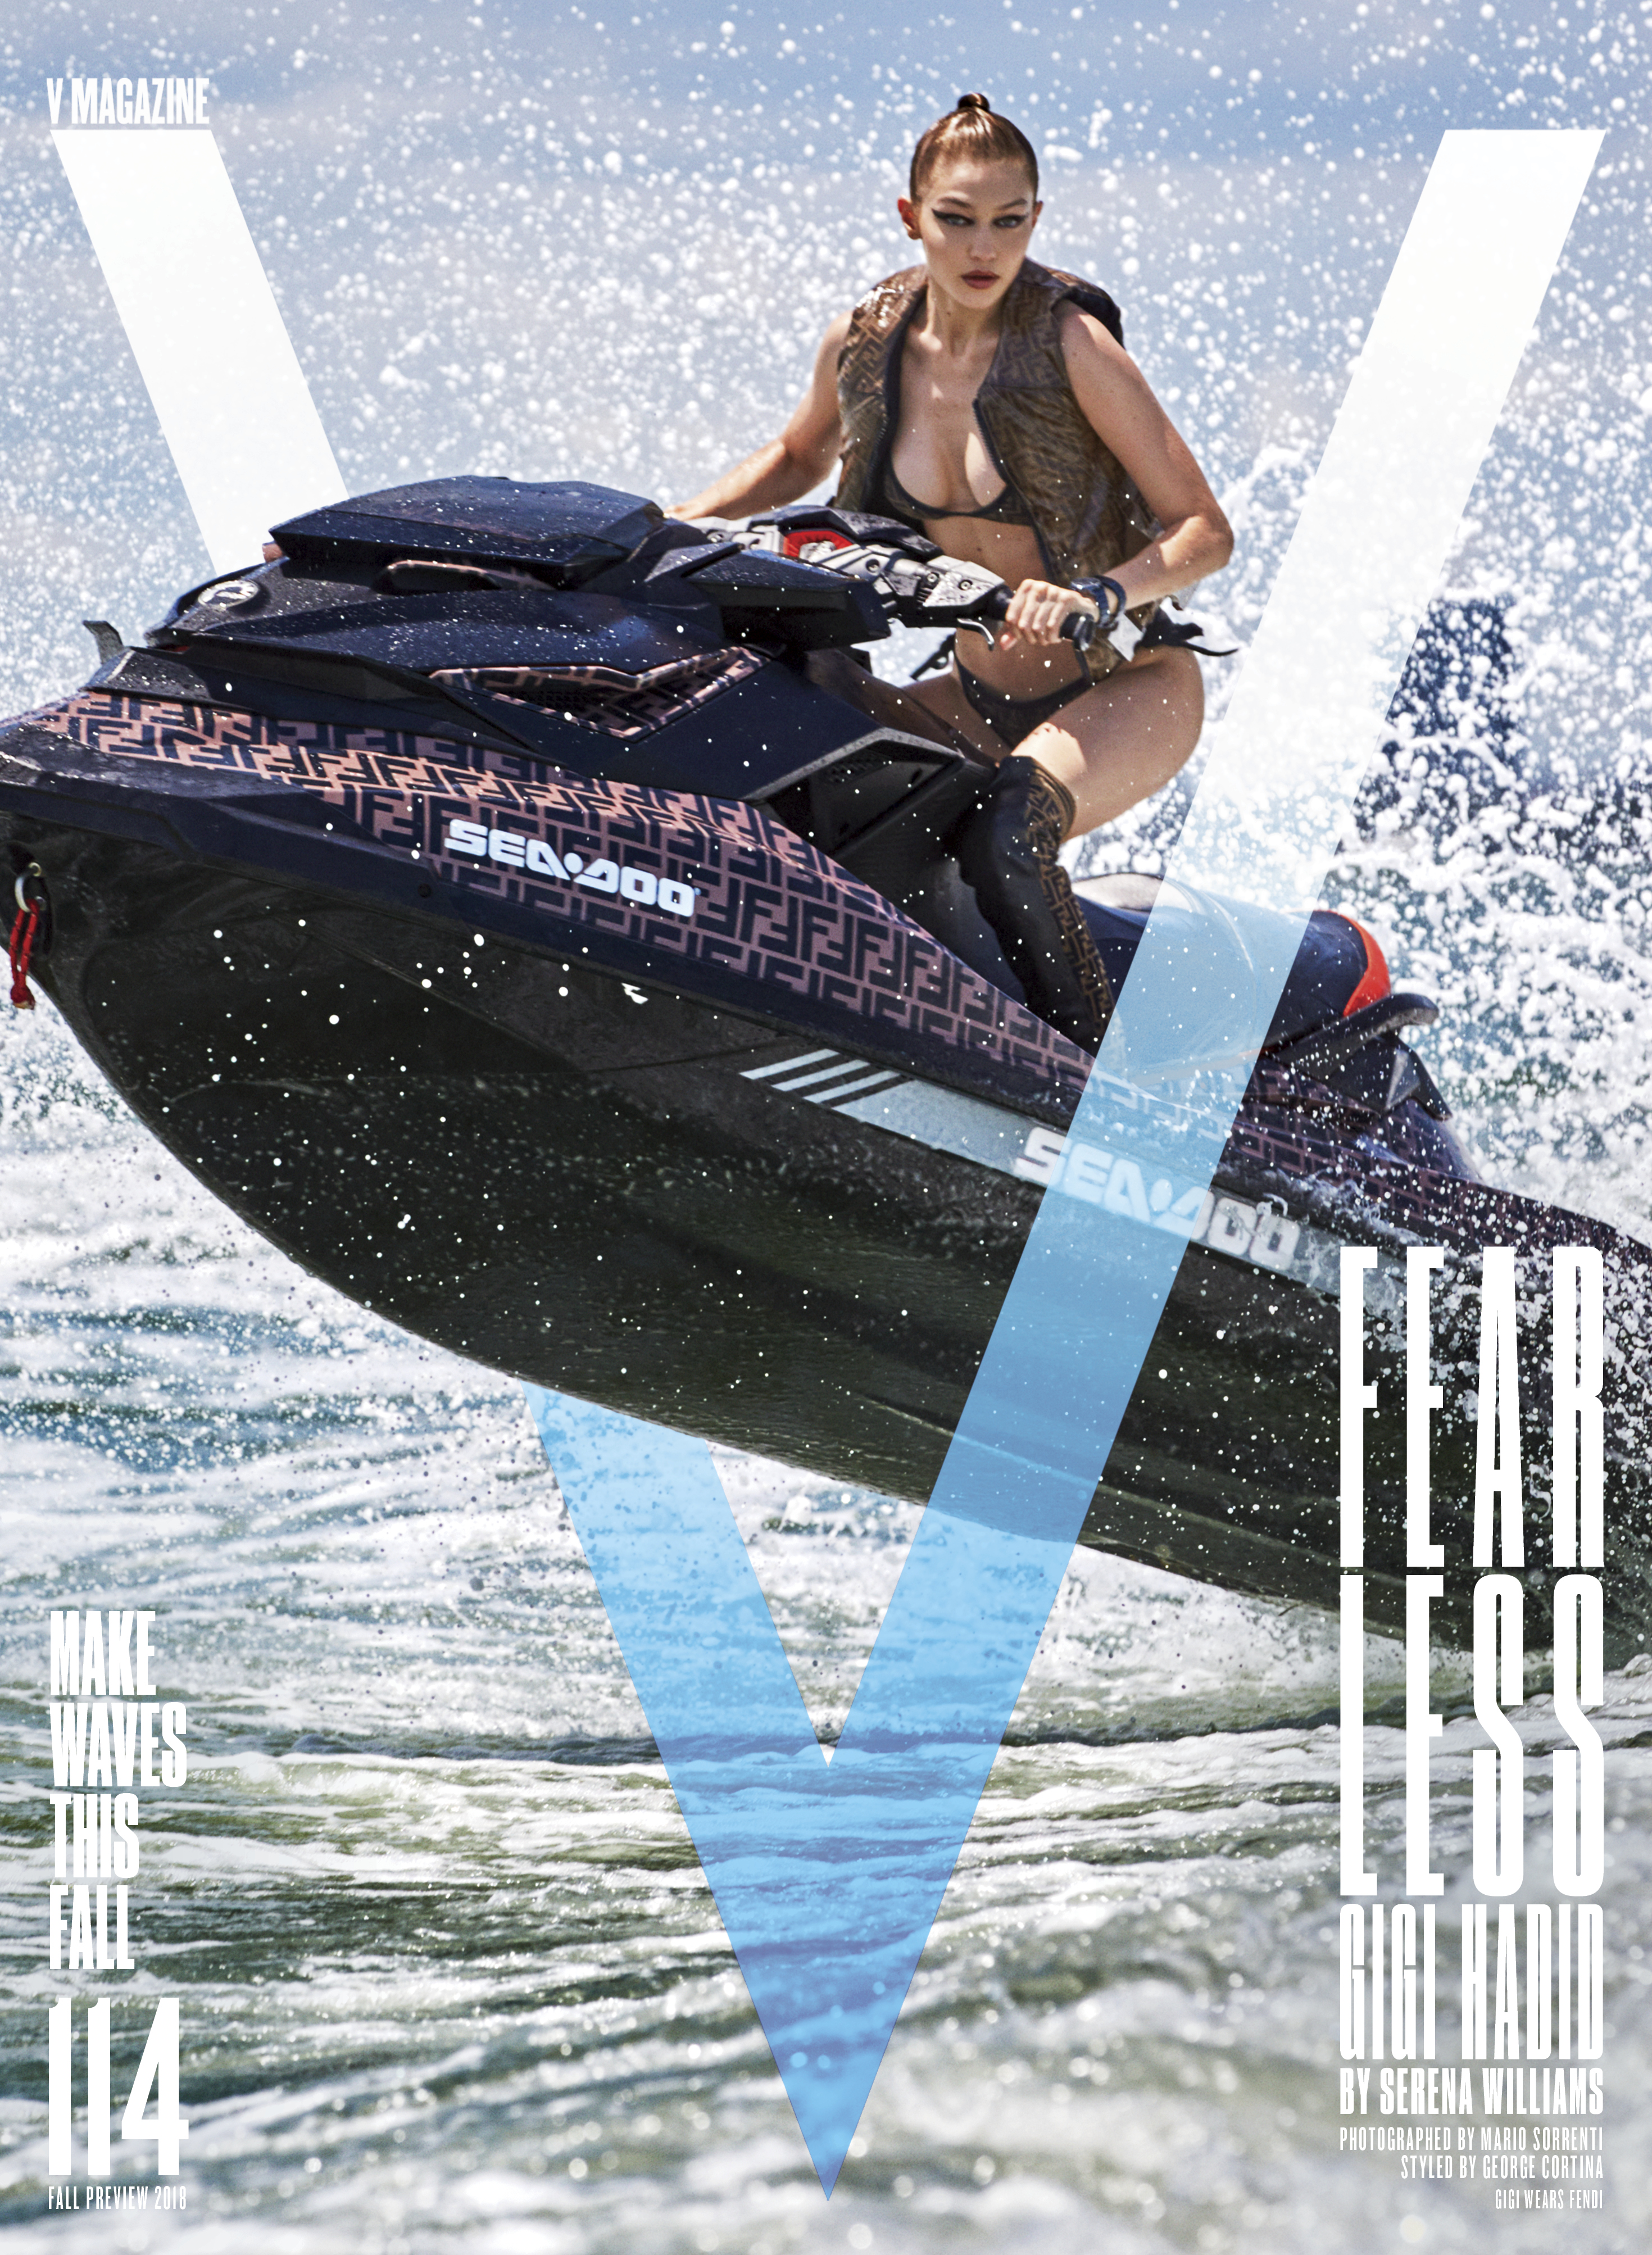 Gigi Hadid on the cover of V Magazine